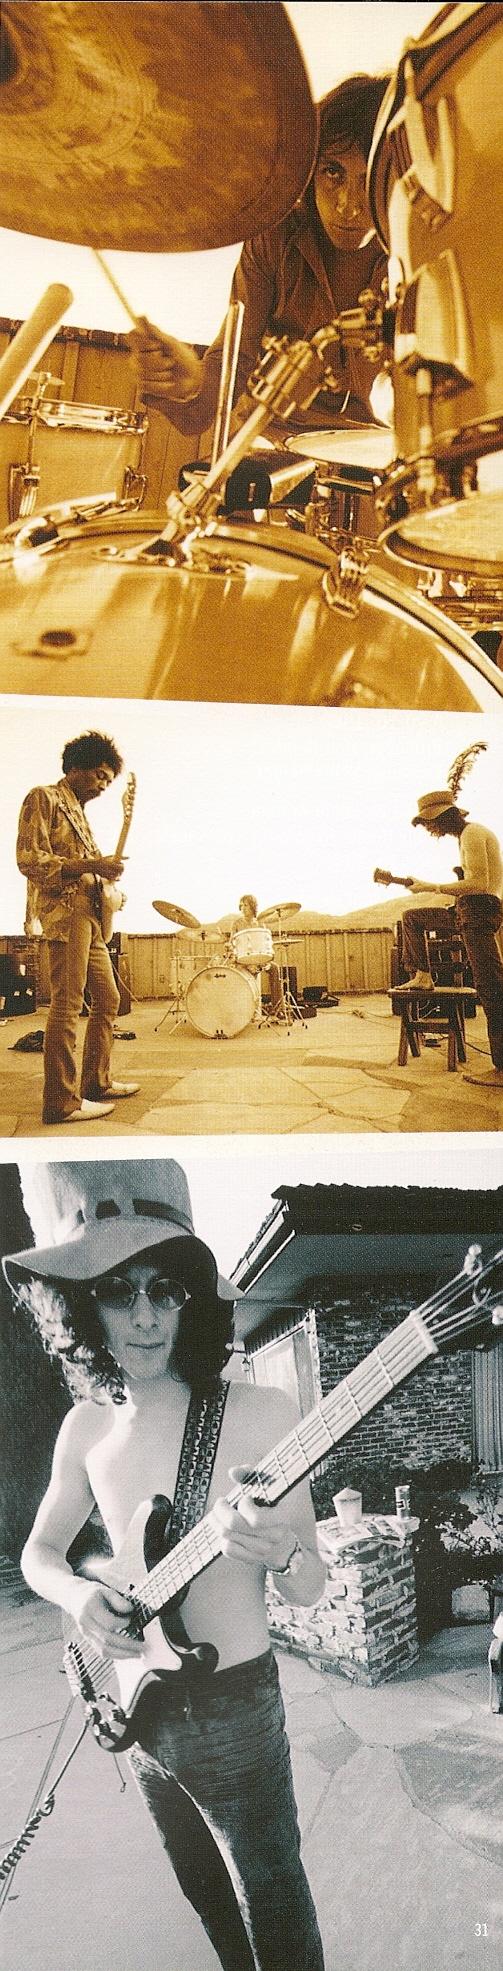 Oakland (Oakland Coliseum) : 13 septembre 1968  535519Numriser0052